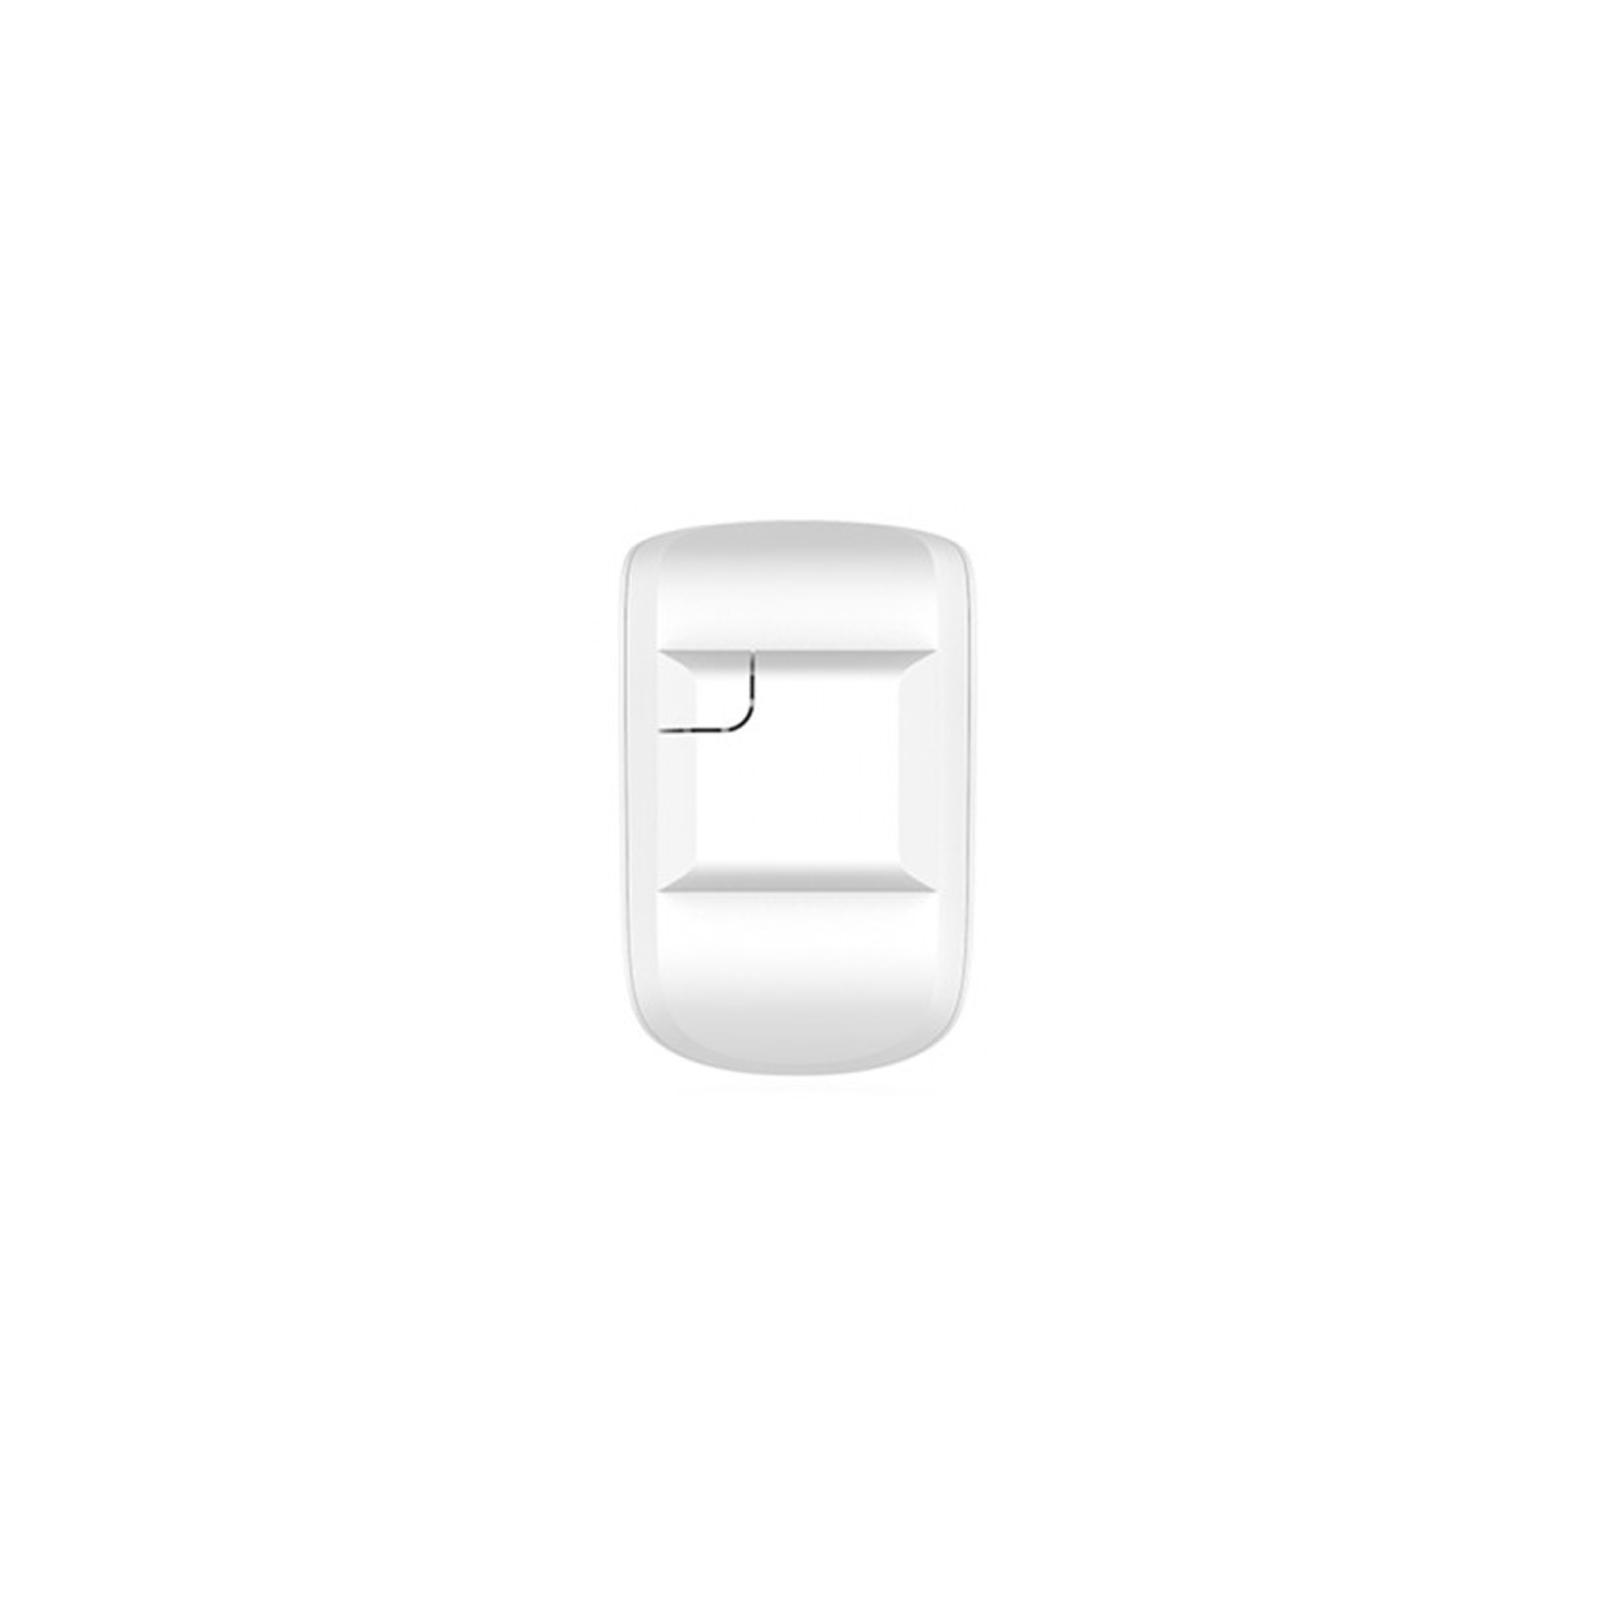 Датчик движения Ajax MotionProtect /white изображение 4